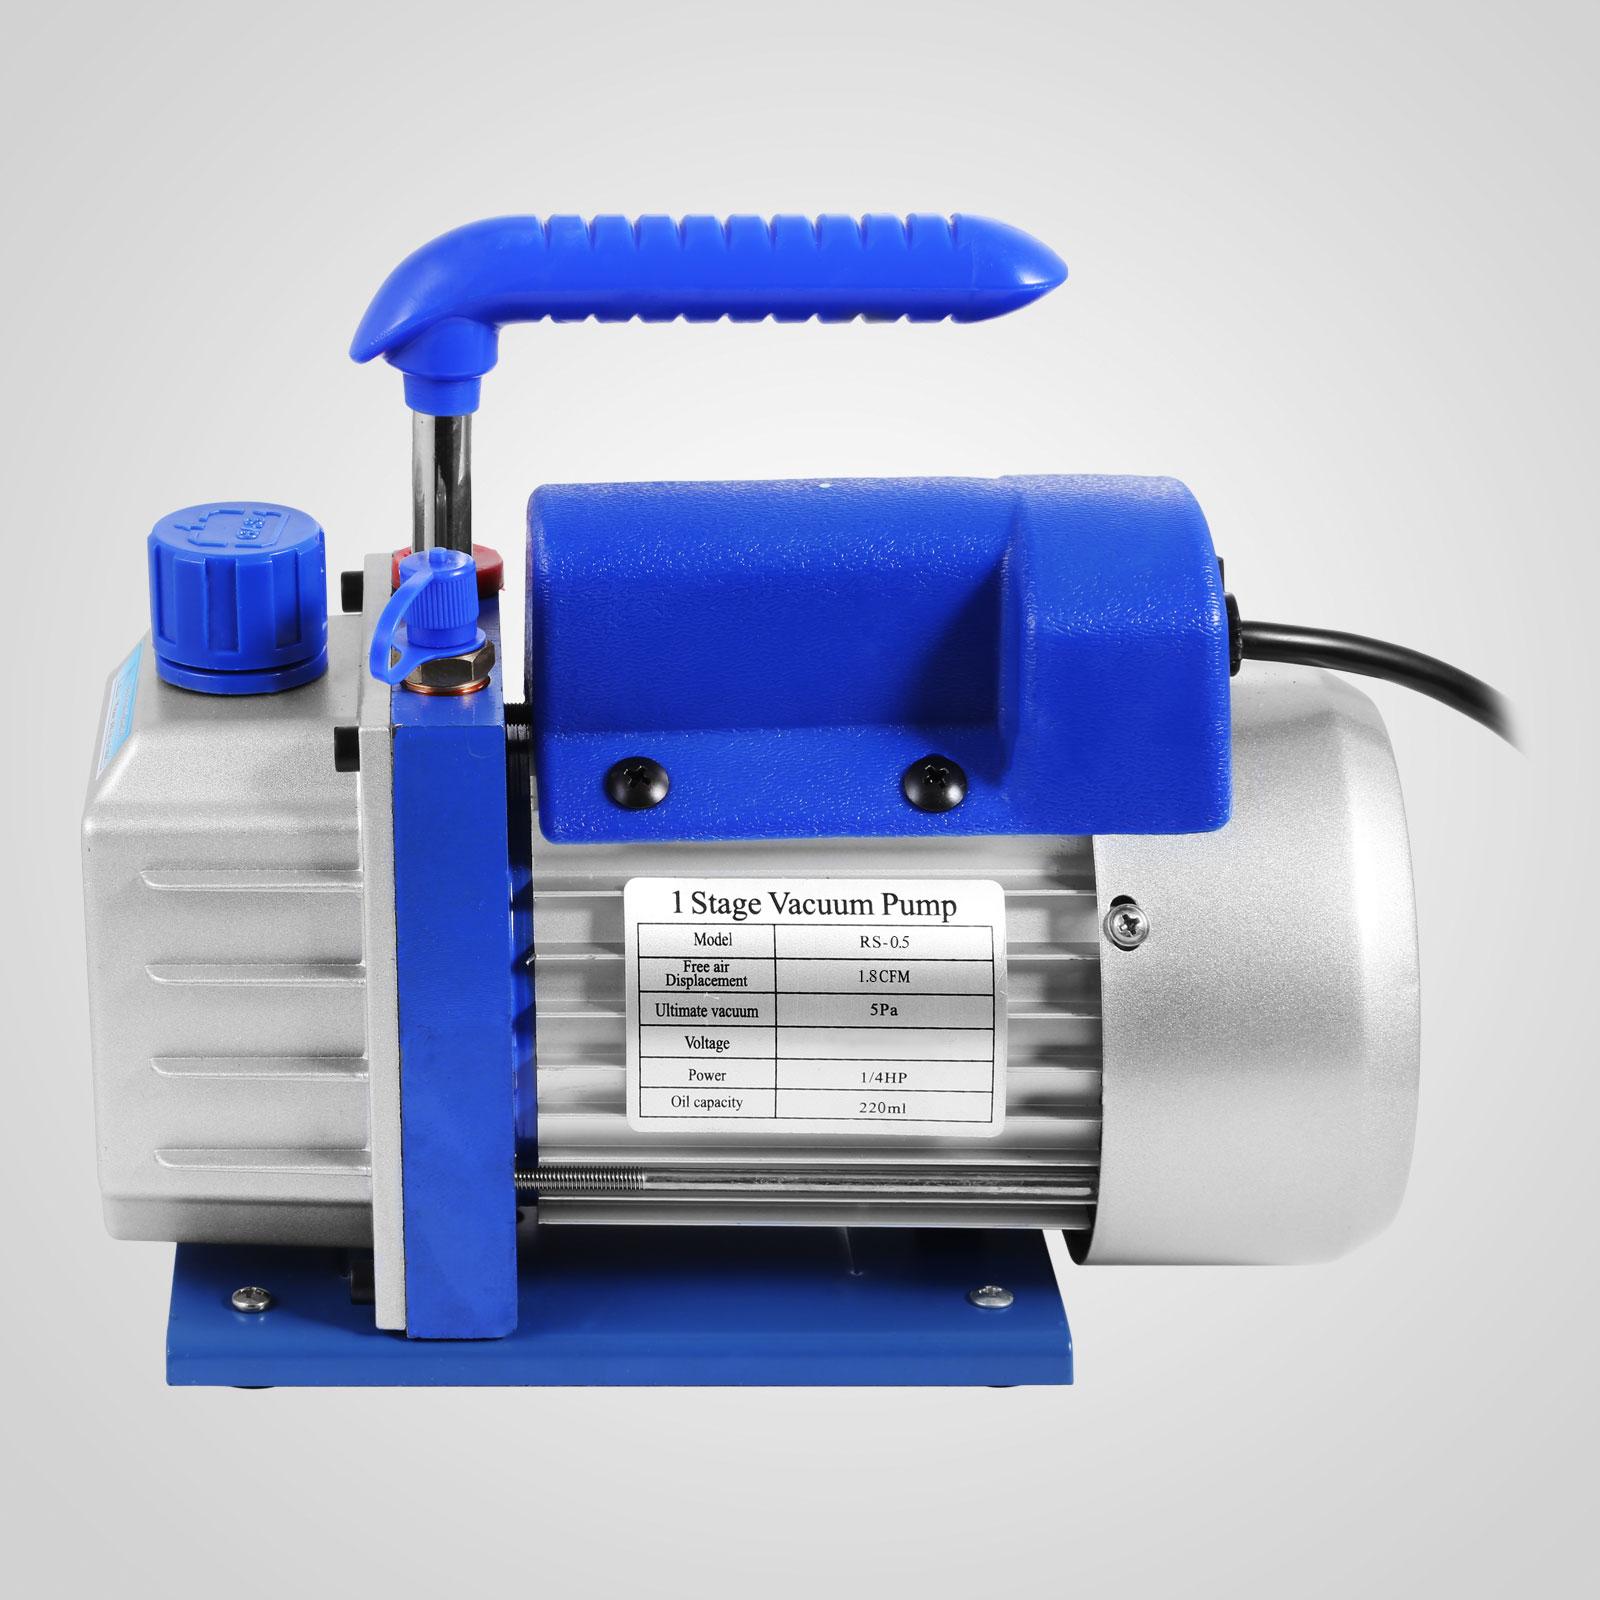 thumbnail 52 - 1-8CFM-3CFM-6CFM-9CFM-Refrigeration-Vacuum-Pump-1-Stage-HVAC-Air-Conditioning